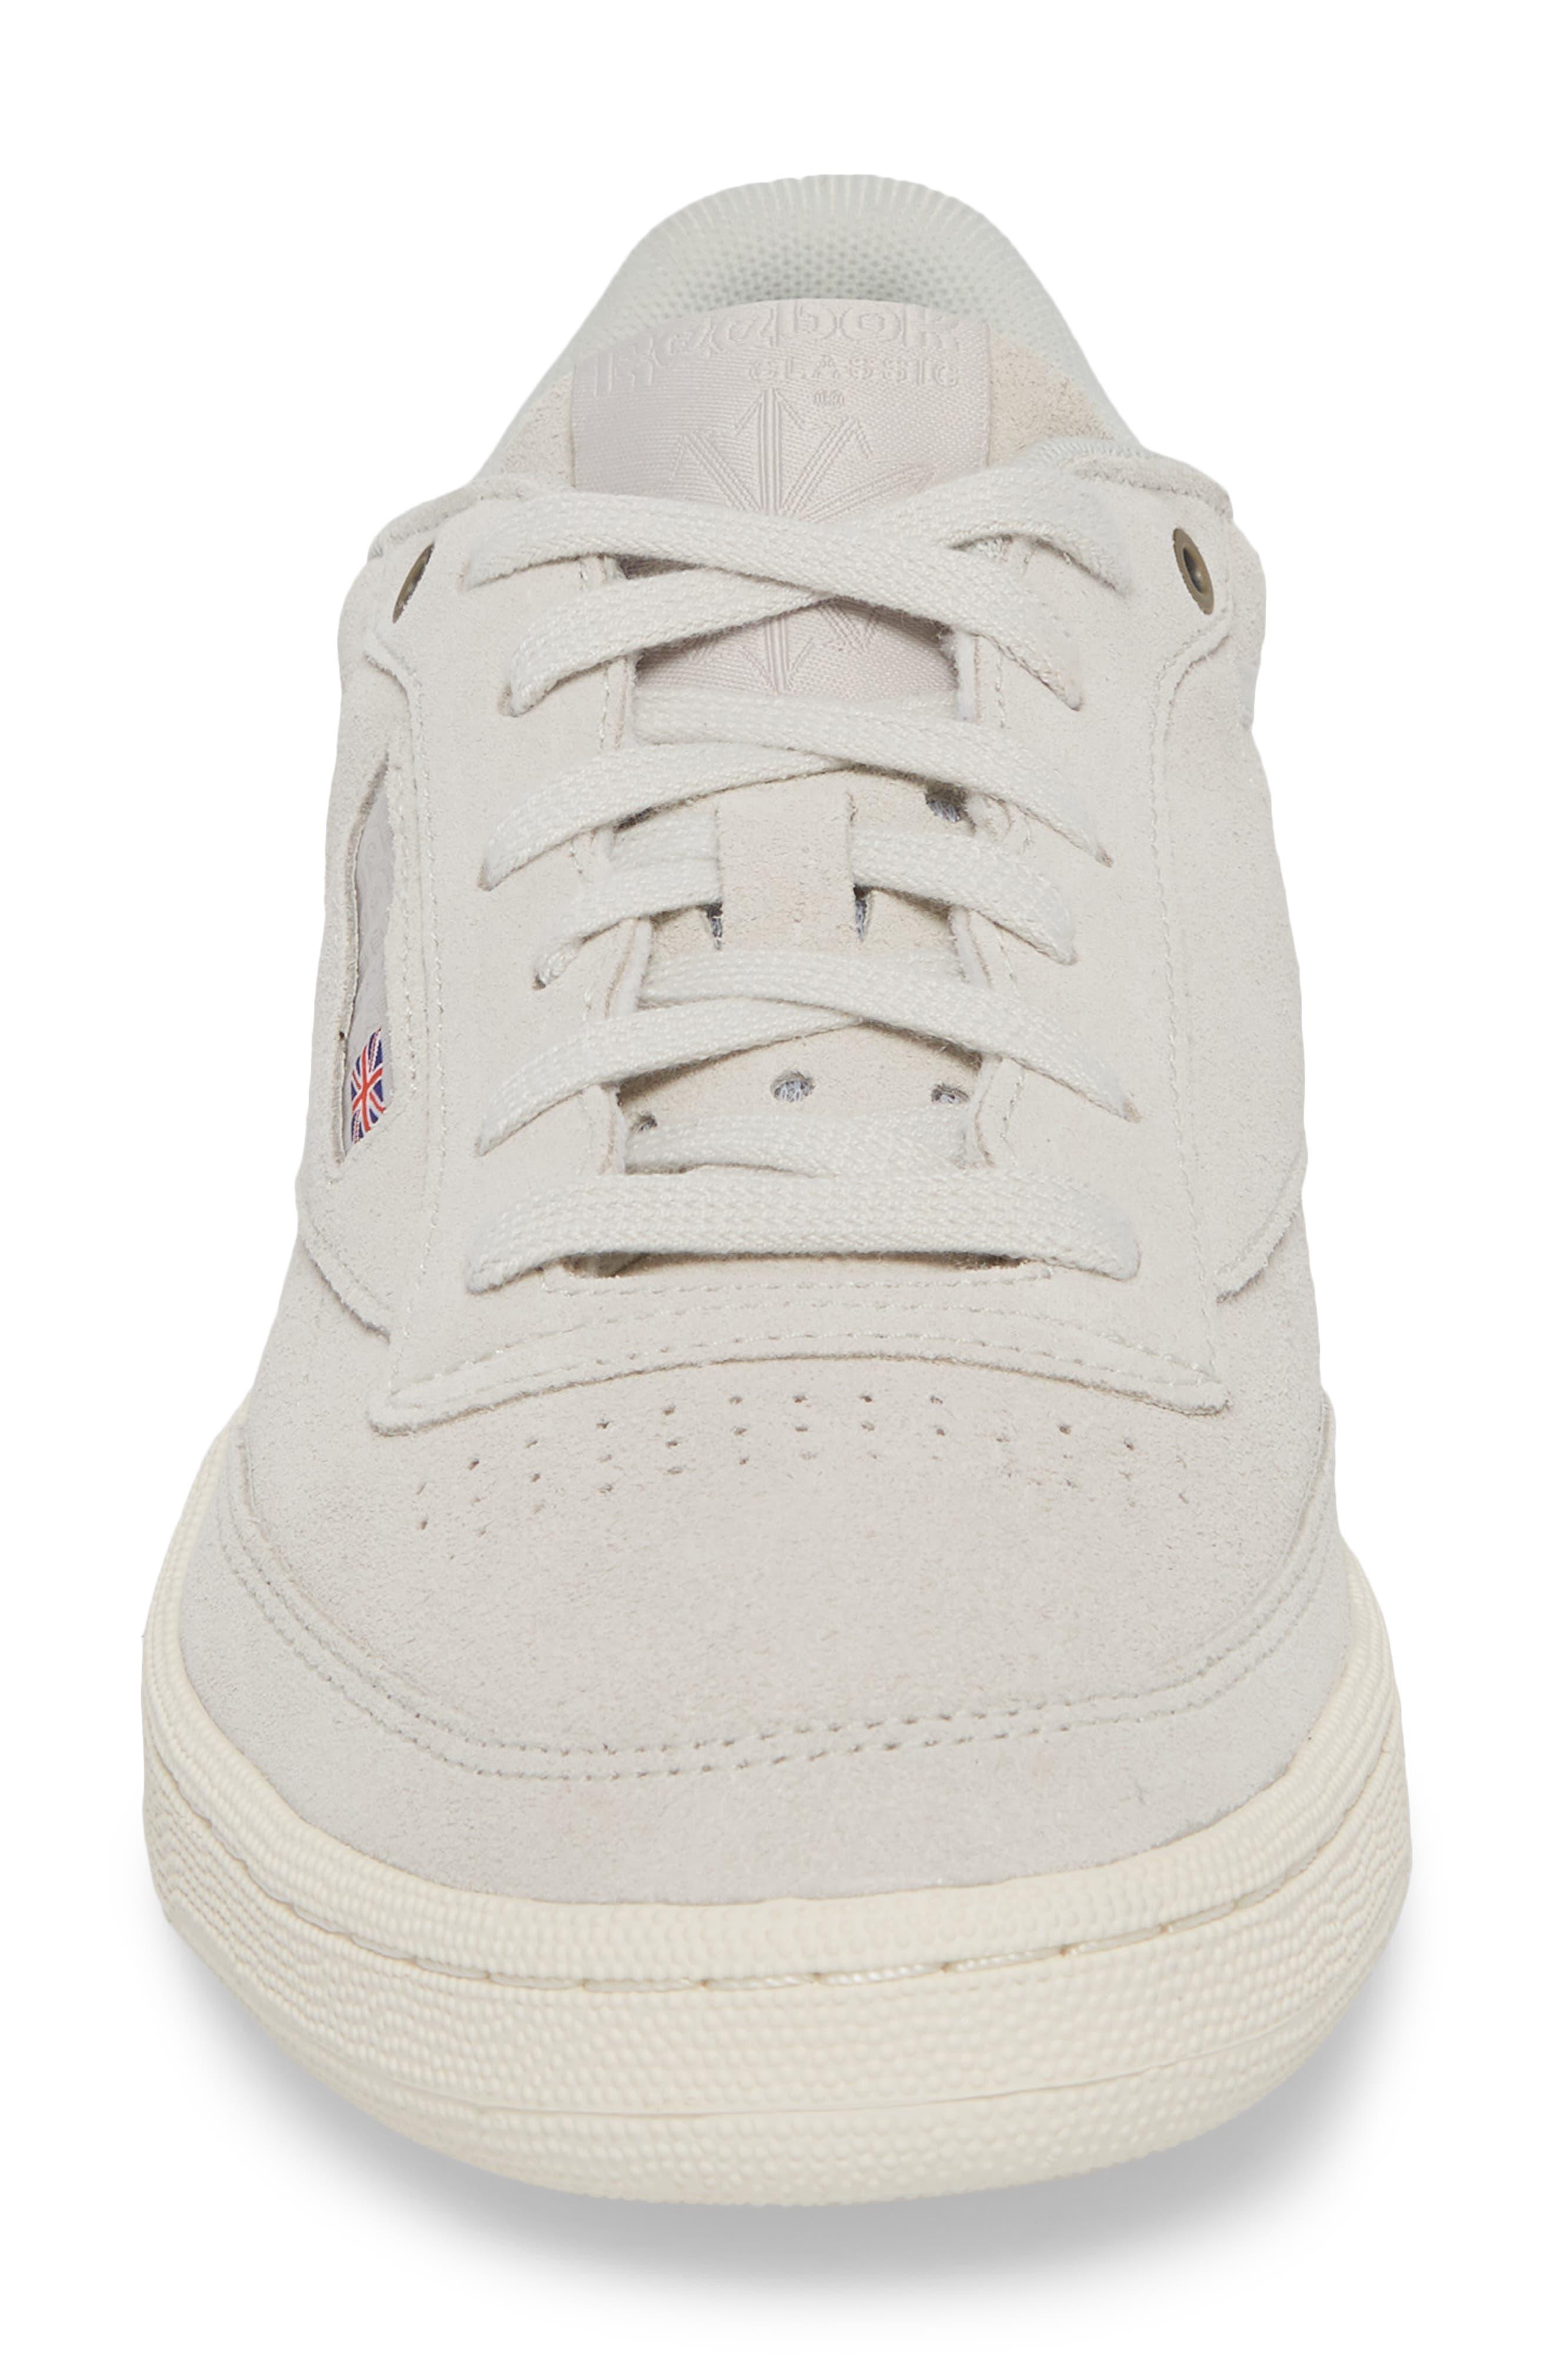 4d1acfecf7c81 REEBOK Club C 85 Mcc Sneaker